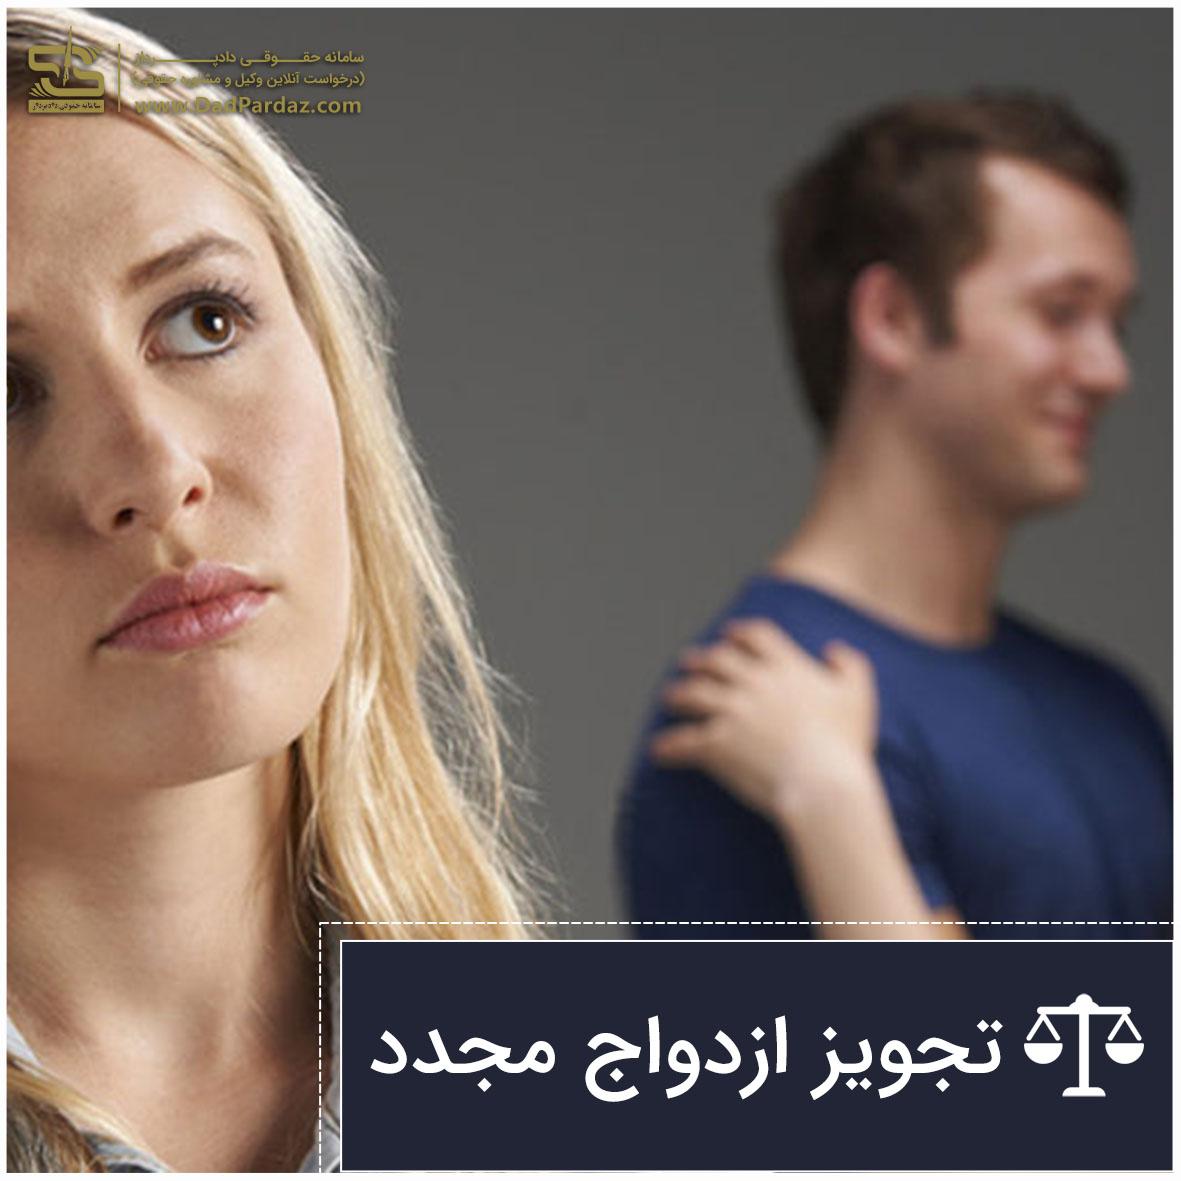 تجویز ازدواج مجدد